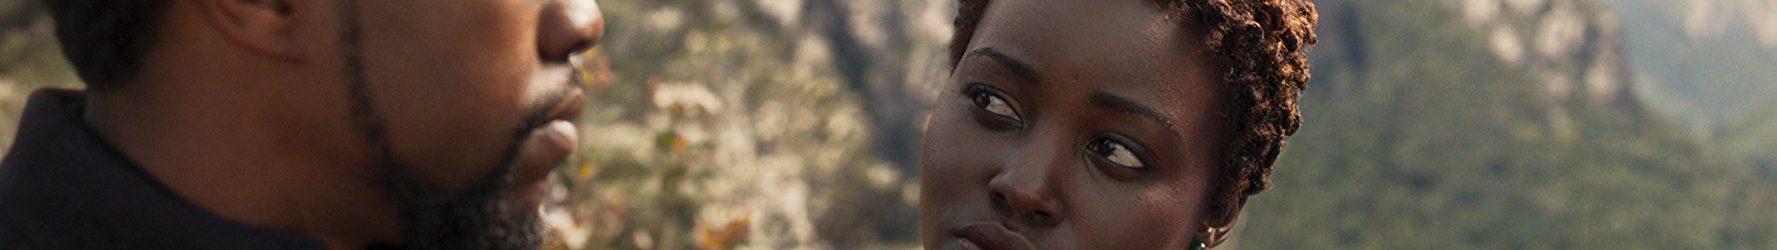 Black Panther, Representation and Activism